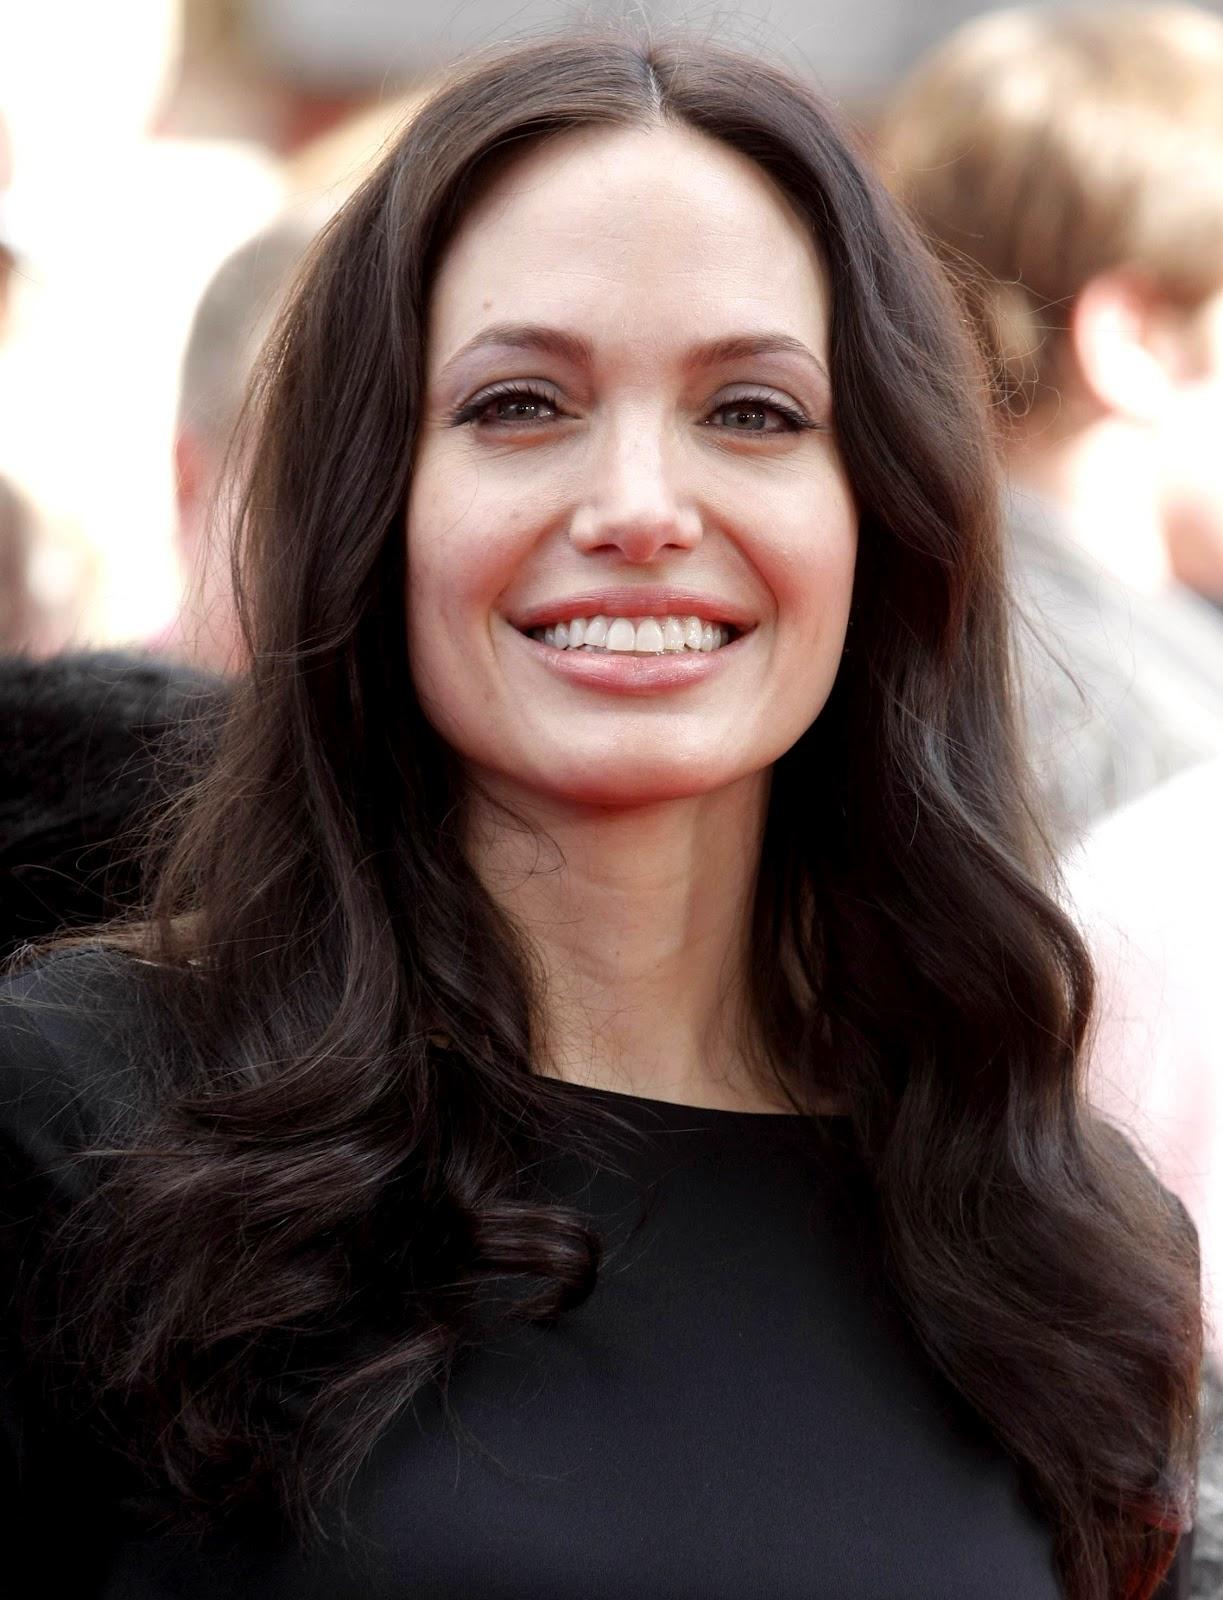 http://1.bp.blogspot.com/-chDdqrJ6FRs/UDHp3J39UjI/AAAAAAAAU7U/OUodfeJlDJM/s1600/Angelina-Jolie.JPG